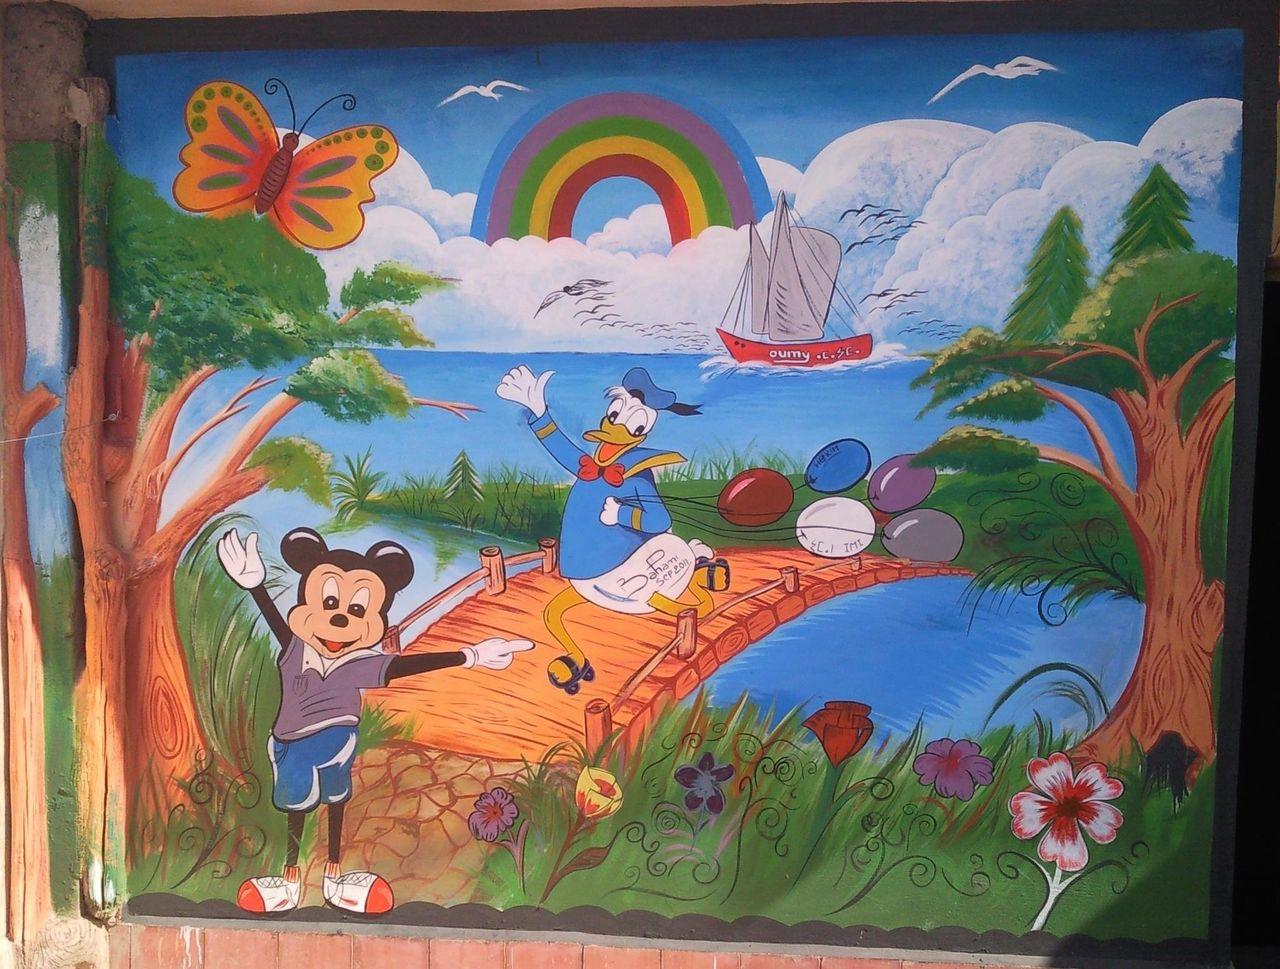 artiste peintre abdelhakim bahami 325413_311316332221365_100000290030758_1340073_1177237489_o